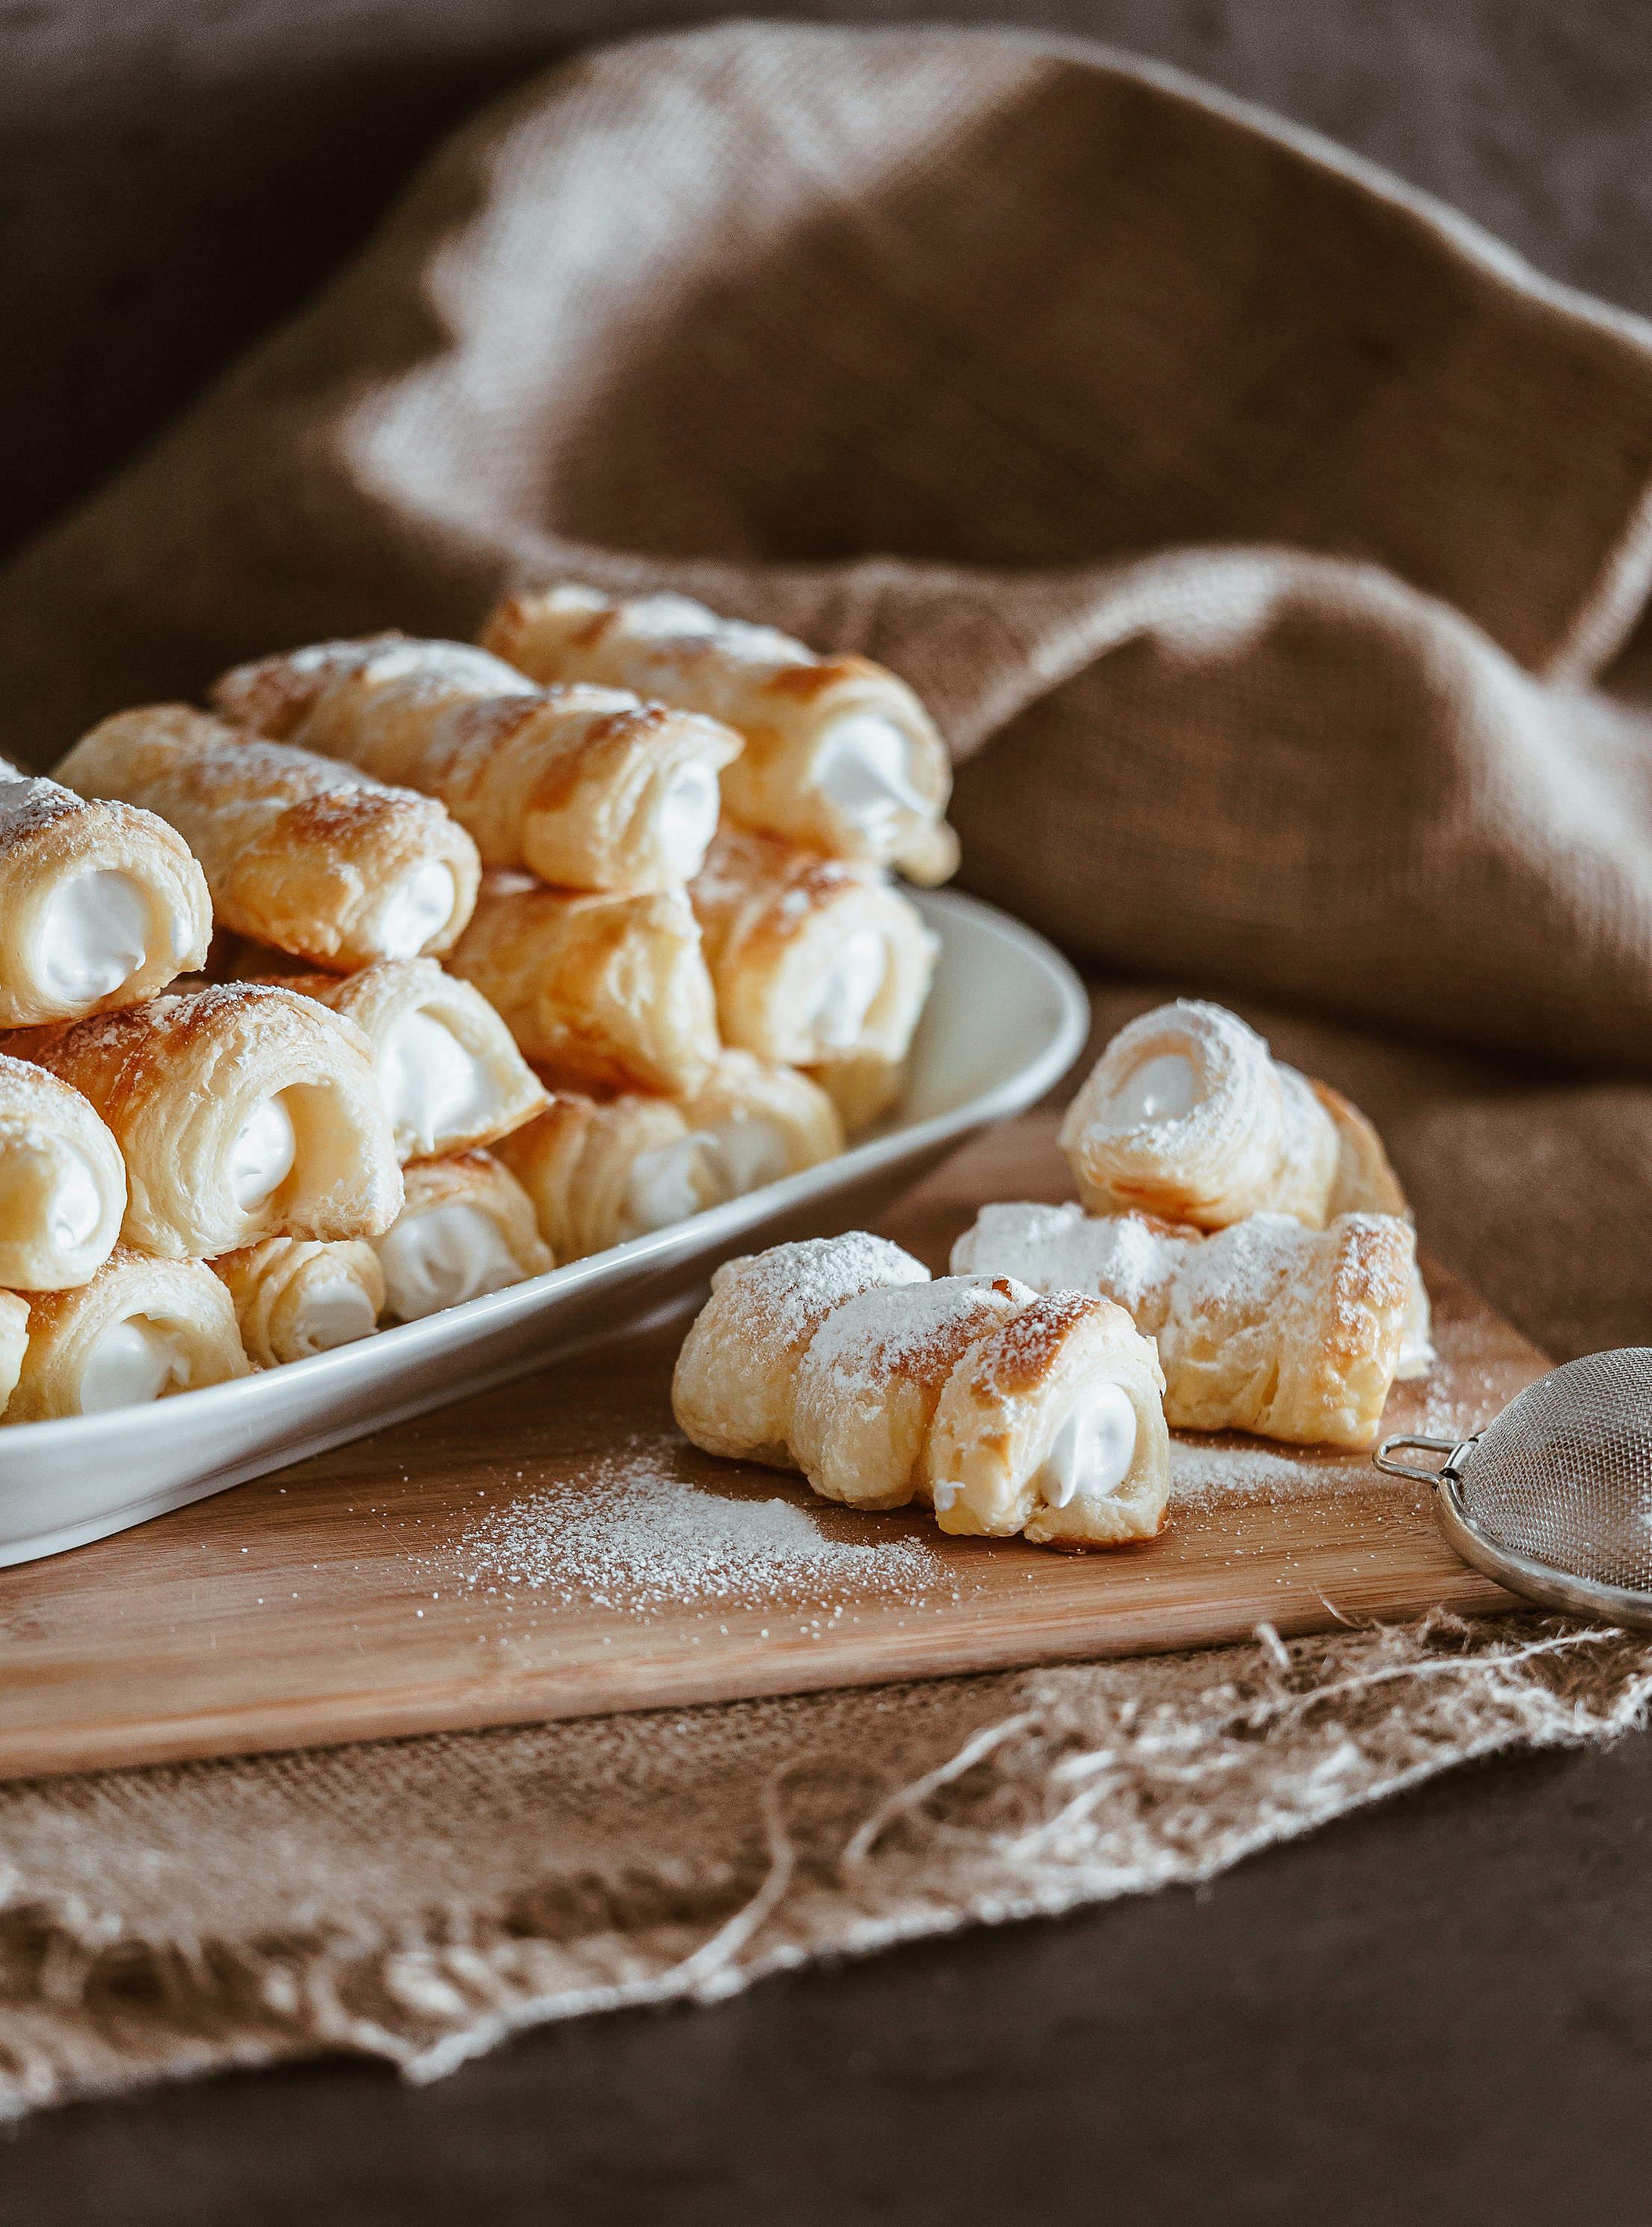 Sweet Austrian Pastry Schaumrollen Free Stock Photo